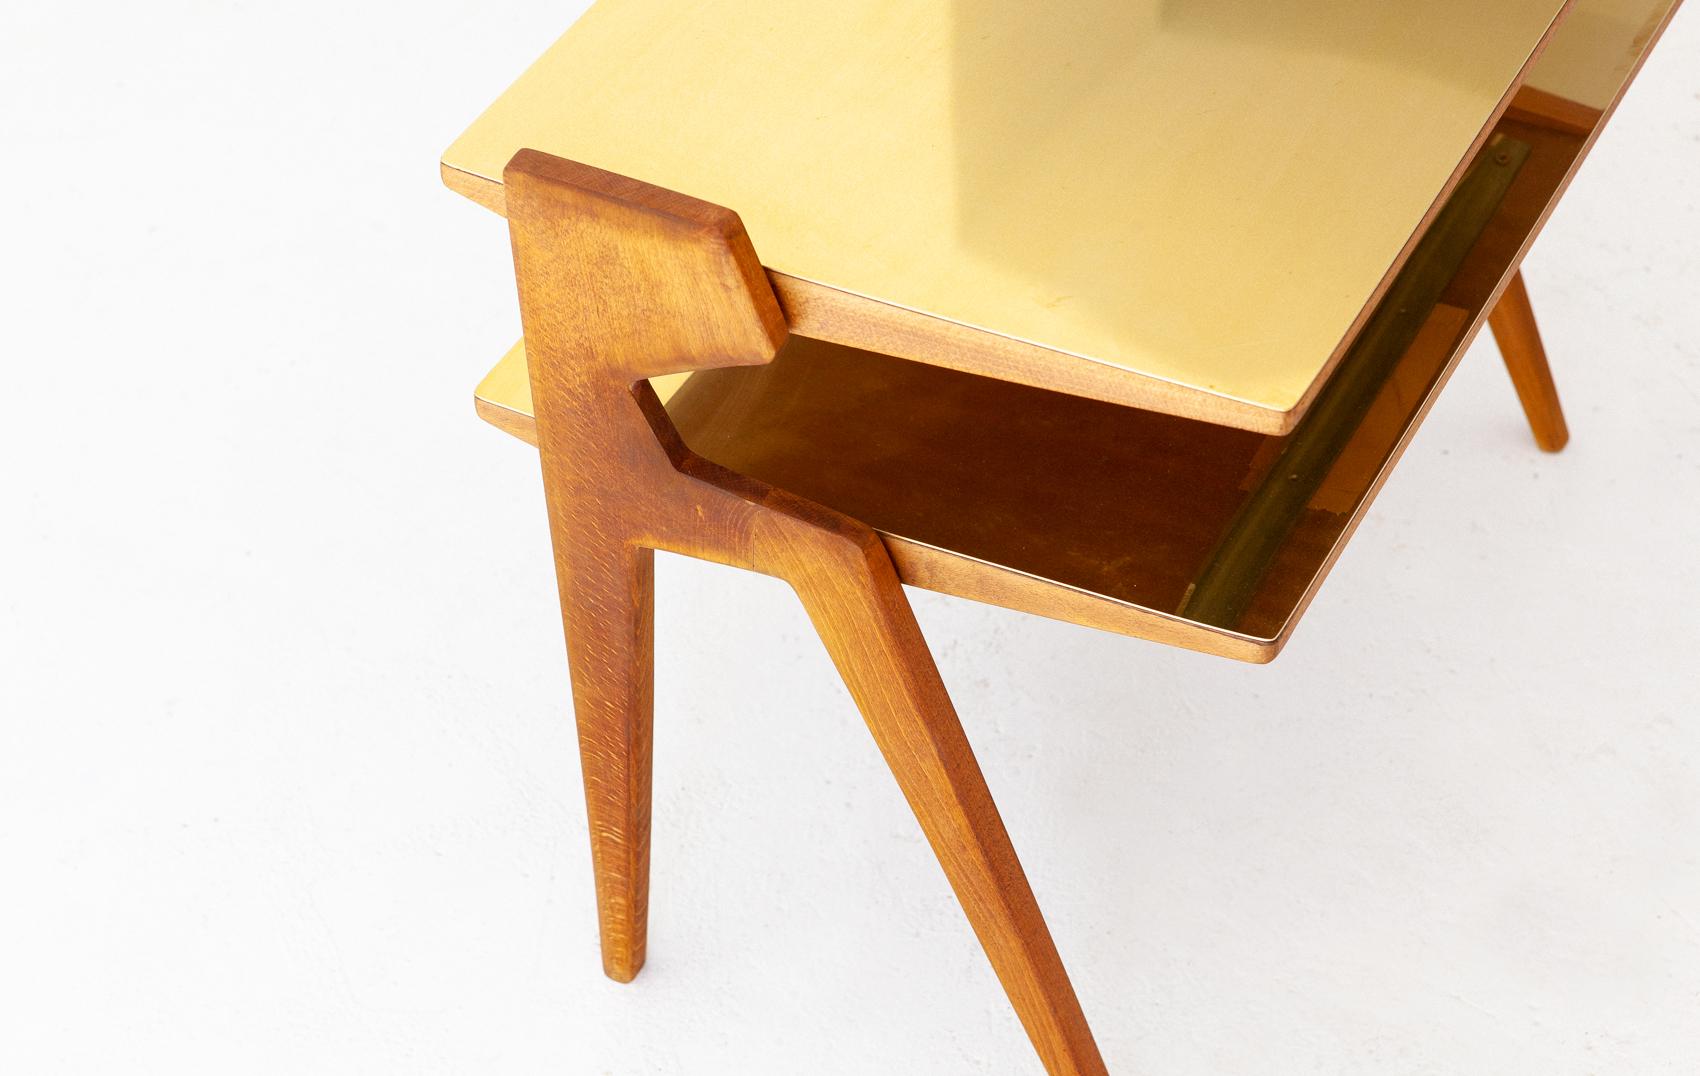 1950s-italian-brass-light-wood-two-levels-side-table-1-t81